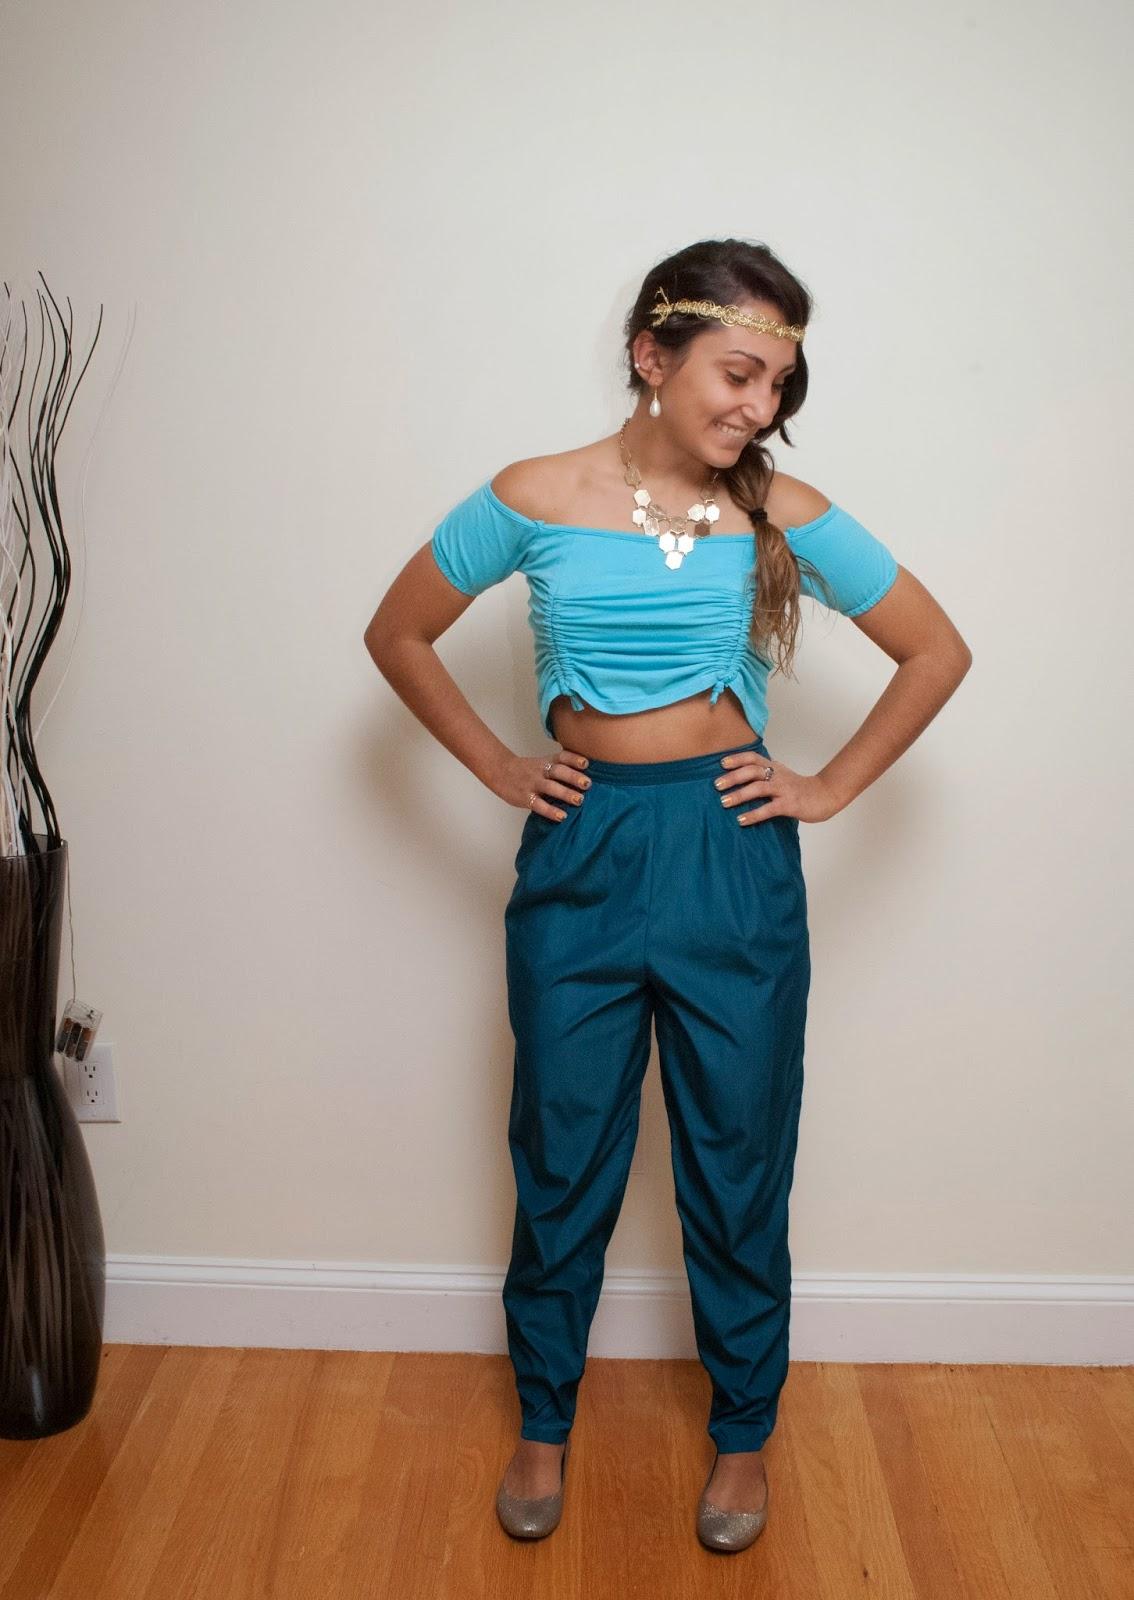 Halloween Costume Ideas Week 2 Of 4 Good Better Dressed  sc 1 st  Meningrey & Princess Jasmine Diy Costume - Meningrey